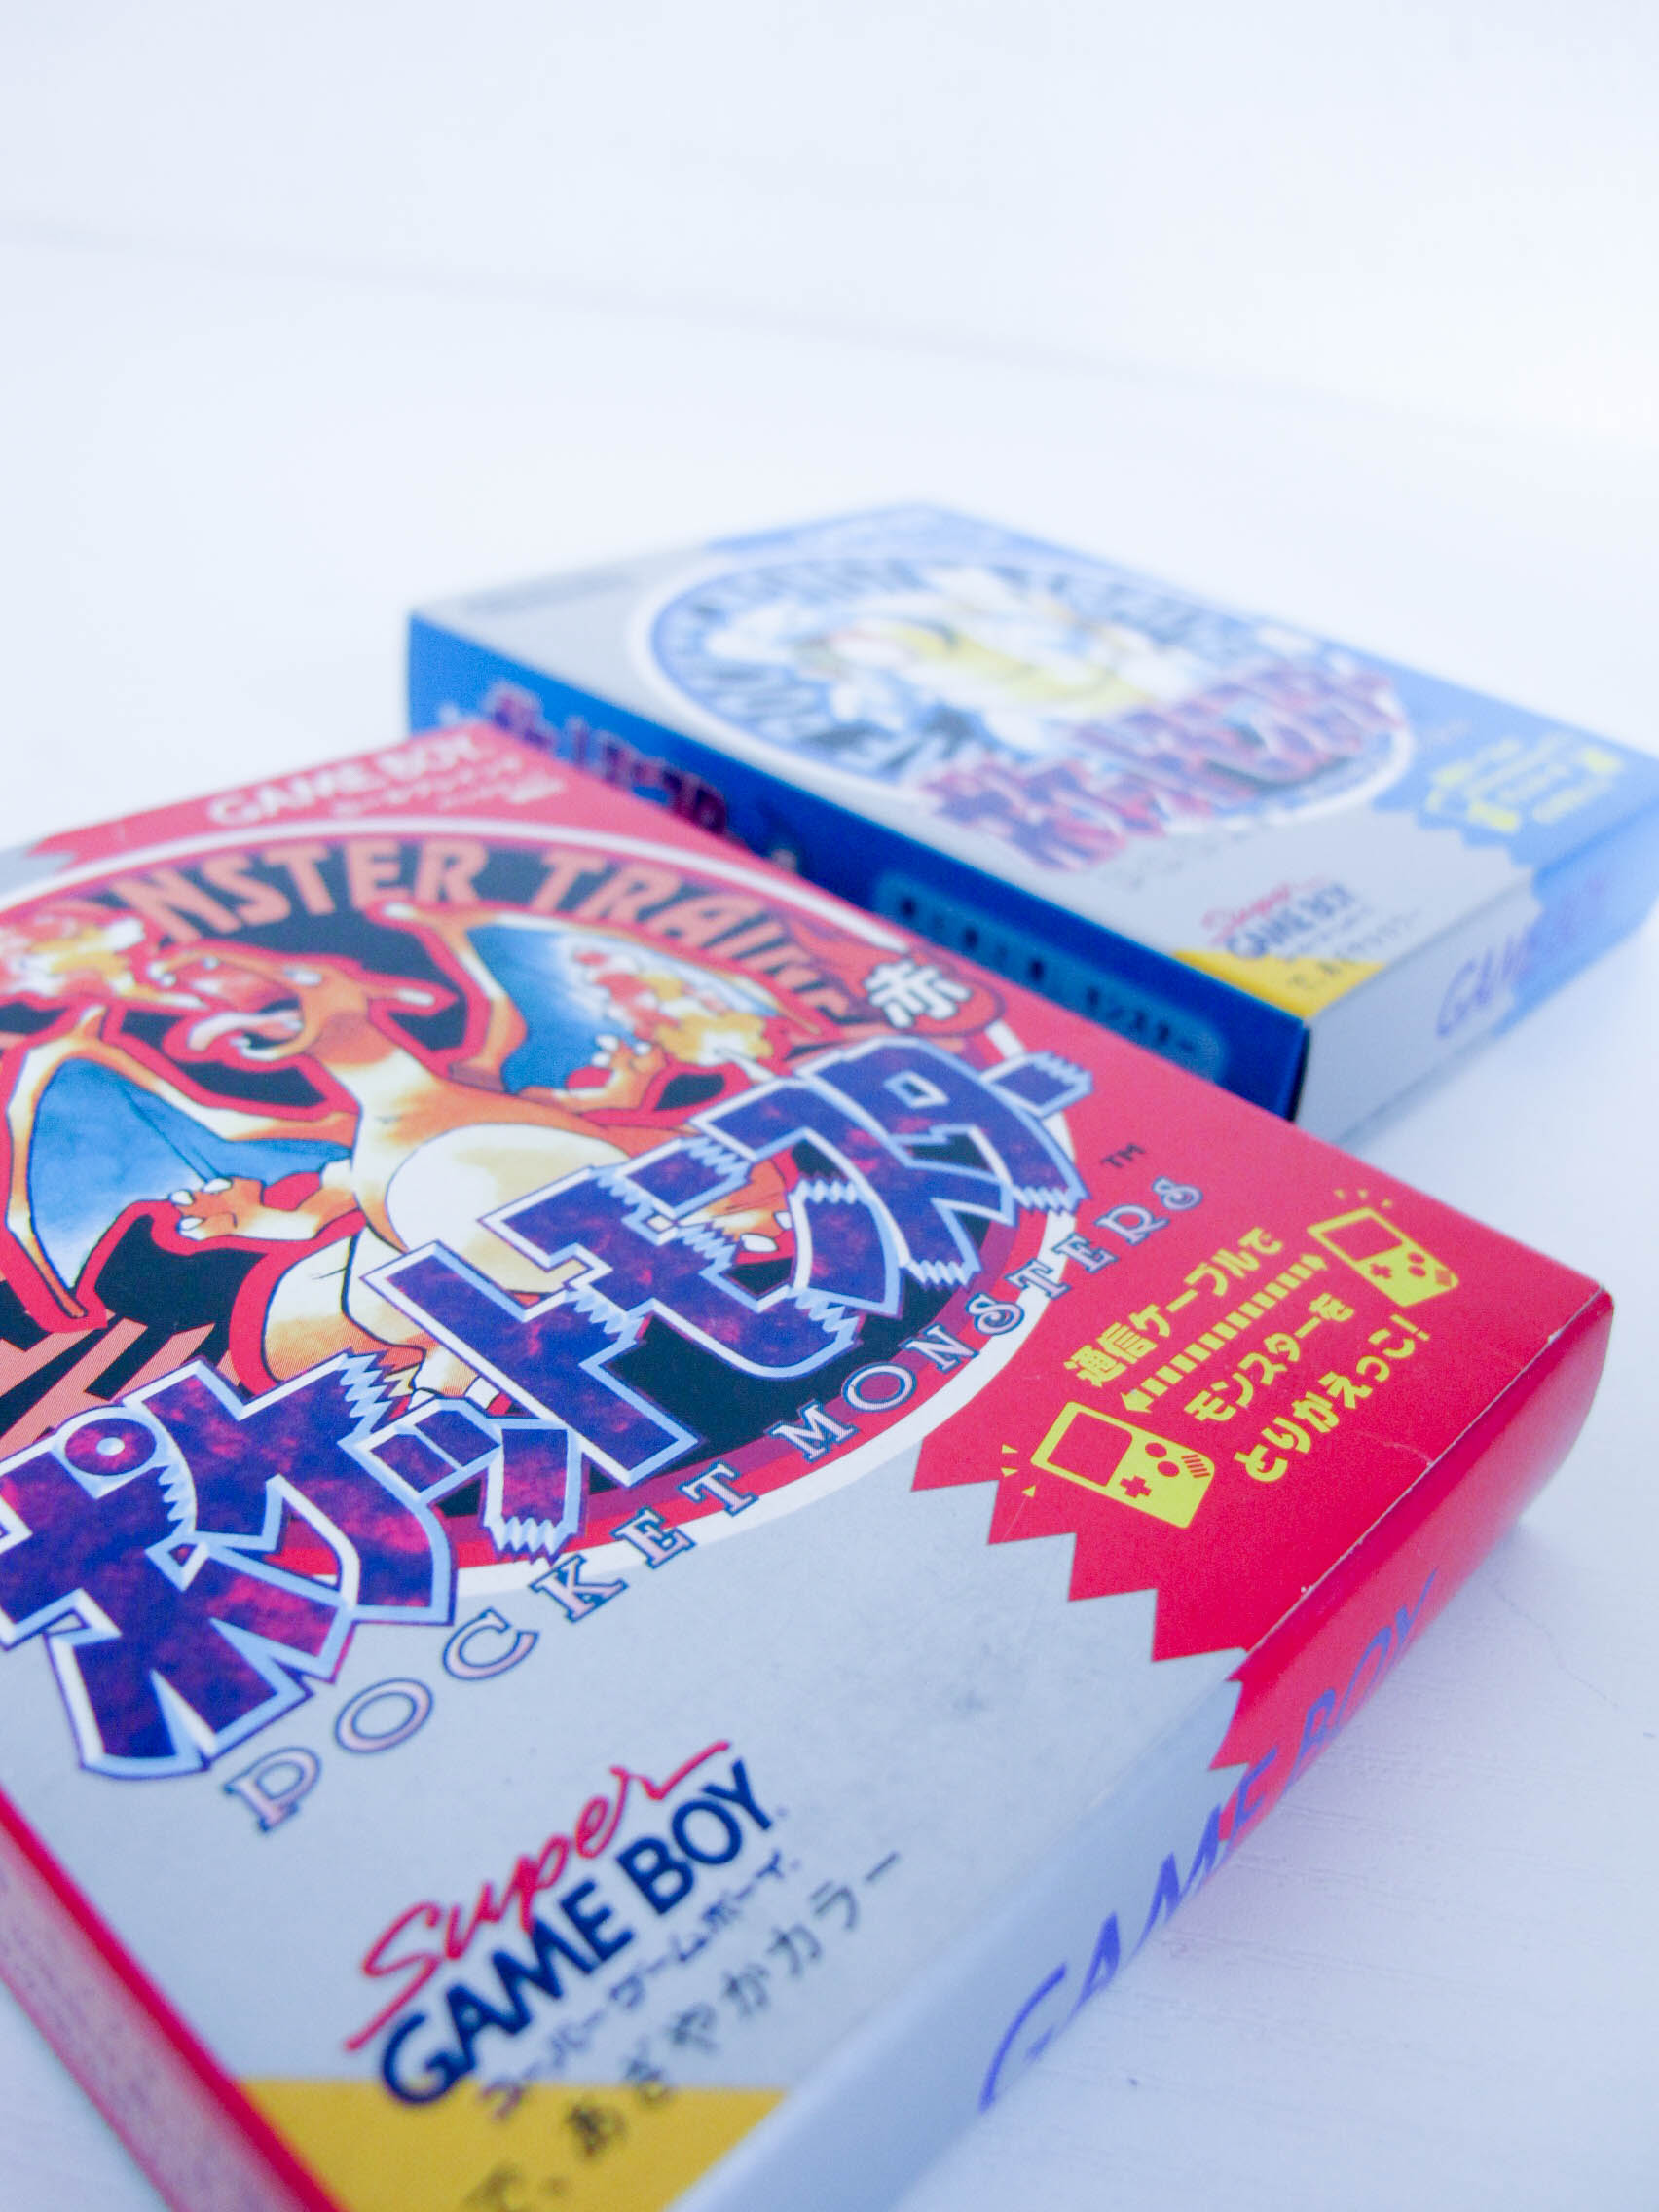 Assorted Pokemon titles